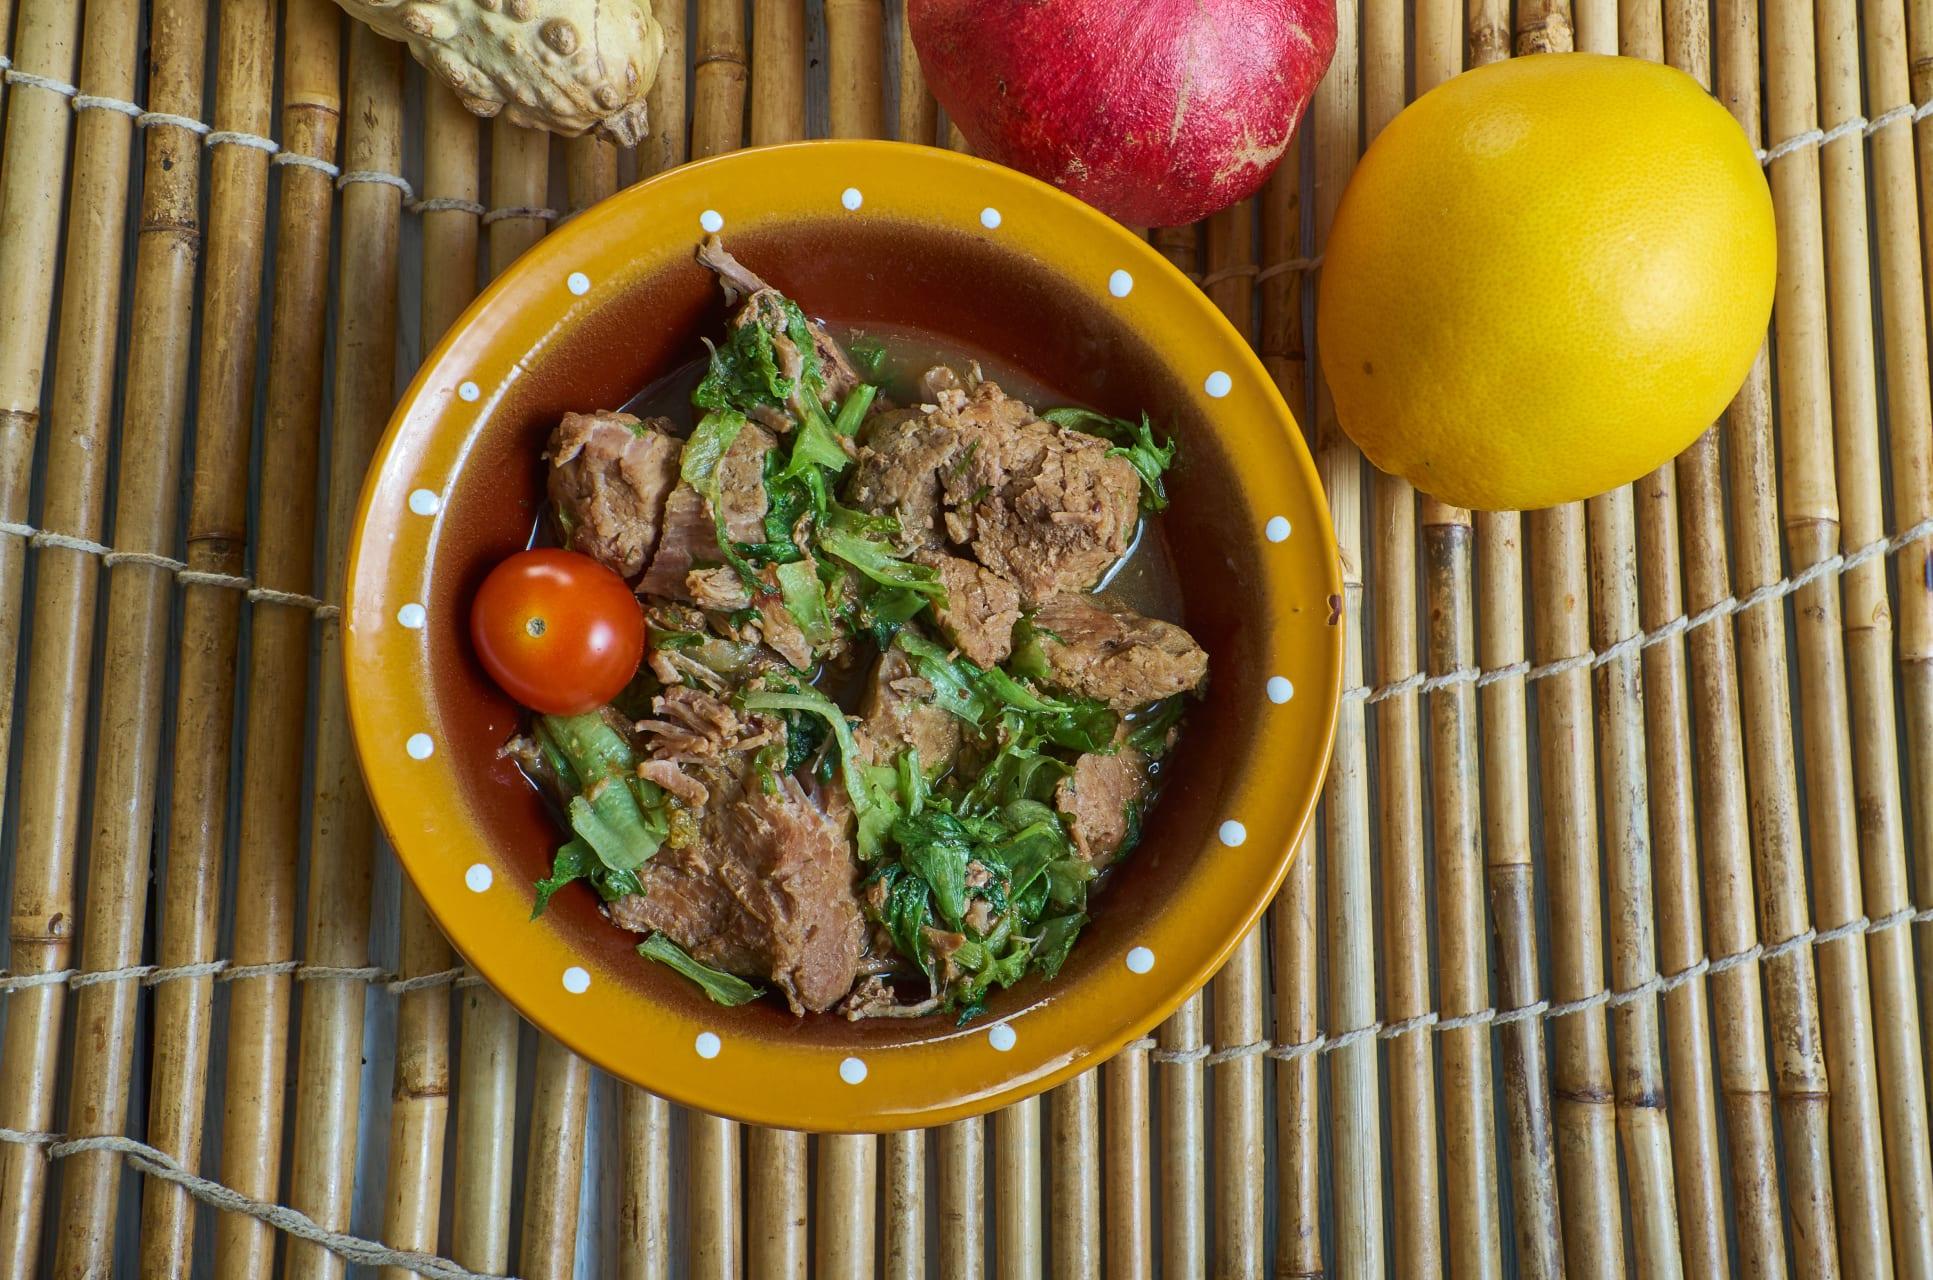 Antananarivo - Culinary Voyage in Madagascar, from Hery's Garden